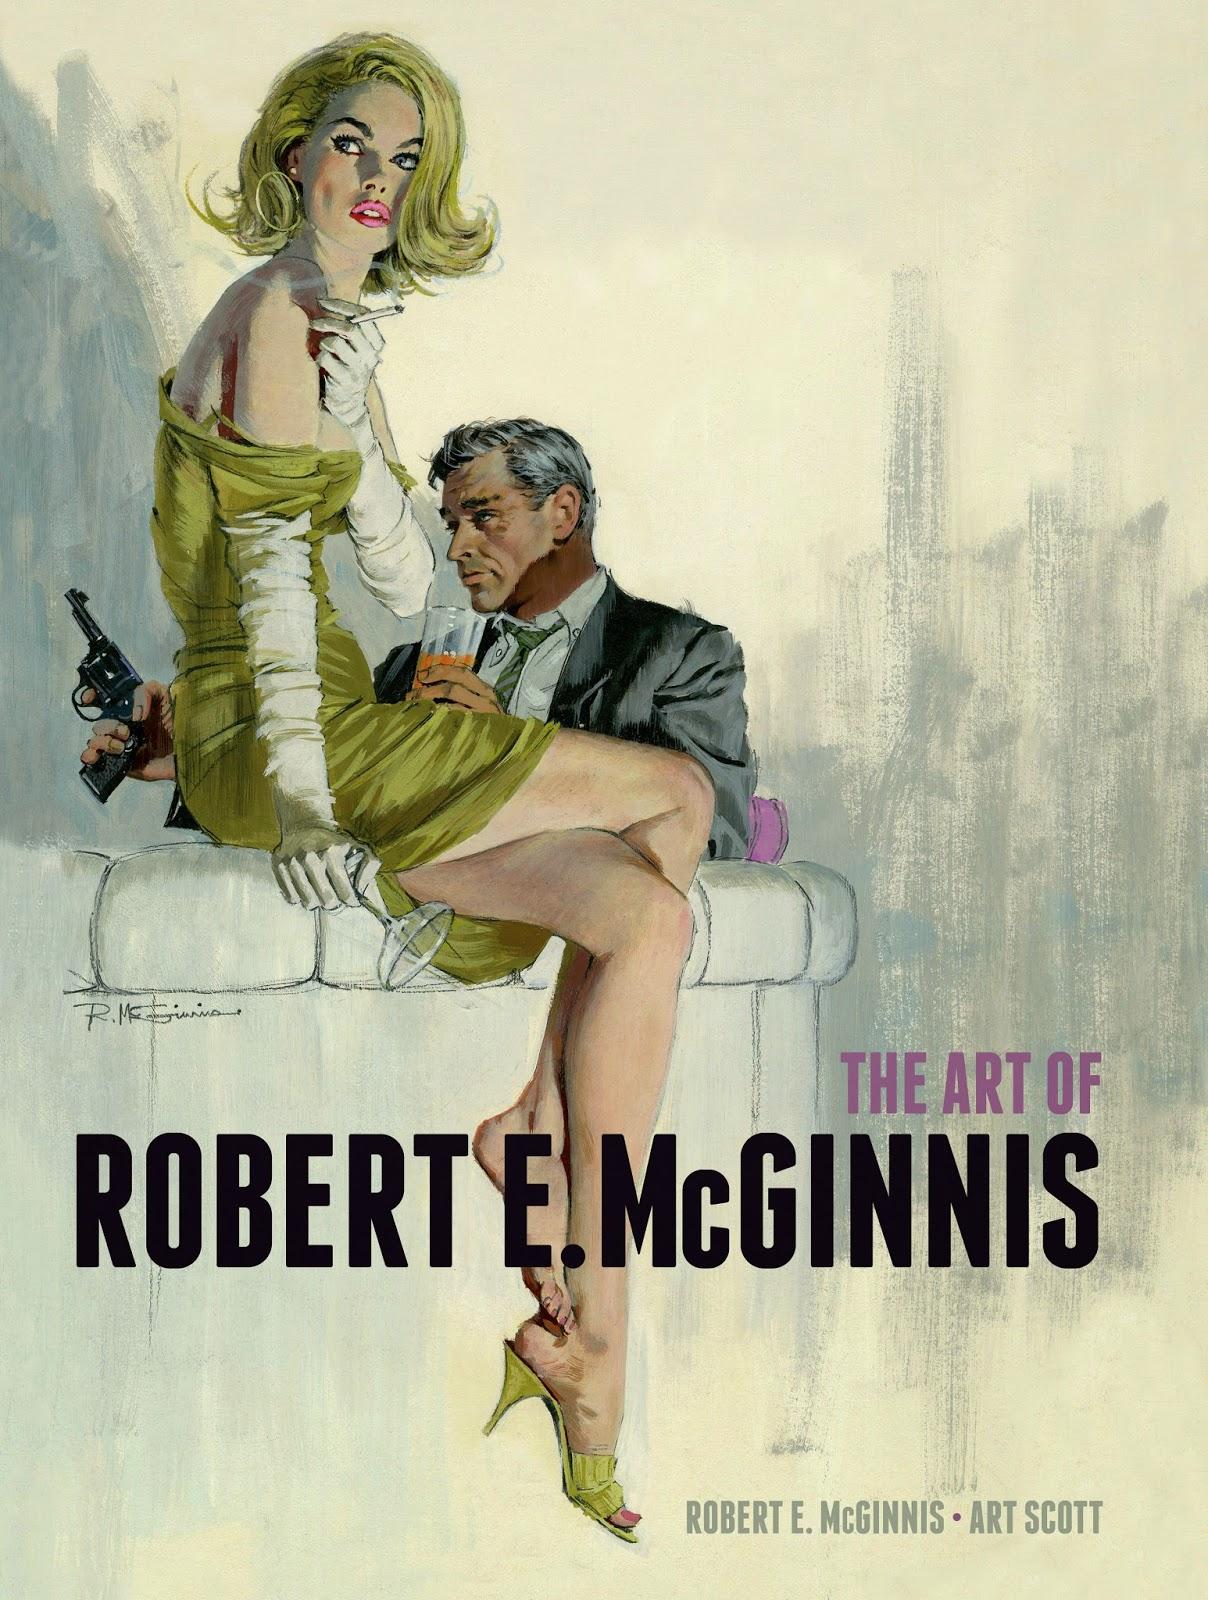 Bob Mcginnis : mcginnis, Sheet:, Honoring, Artistry, McGinnis